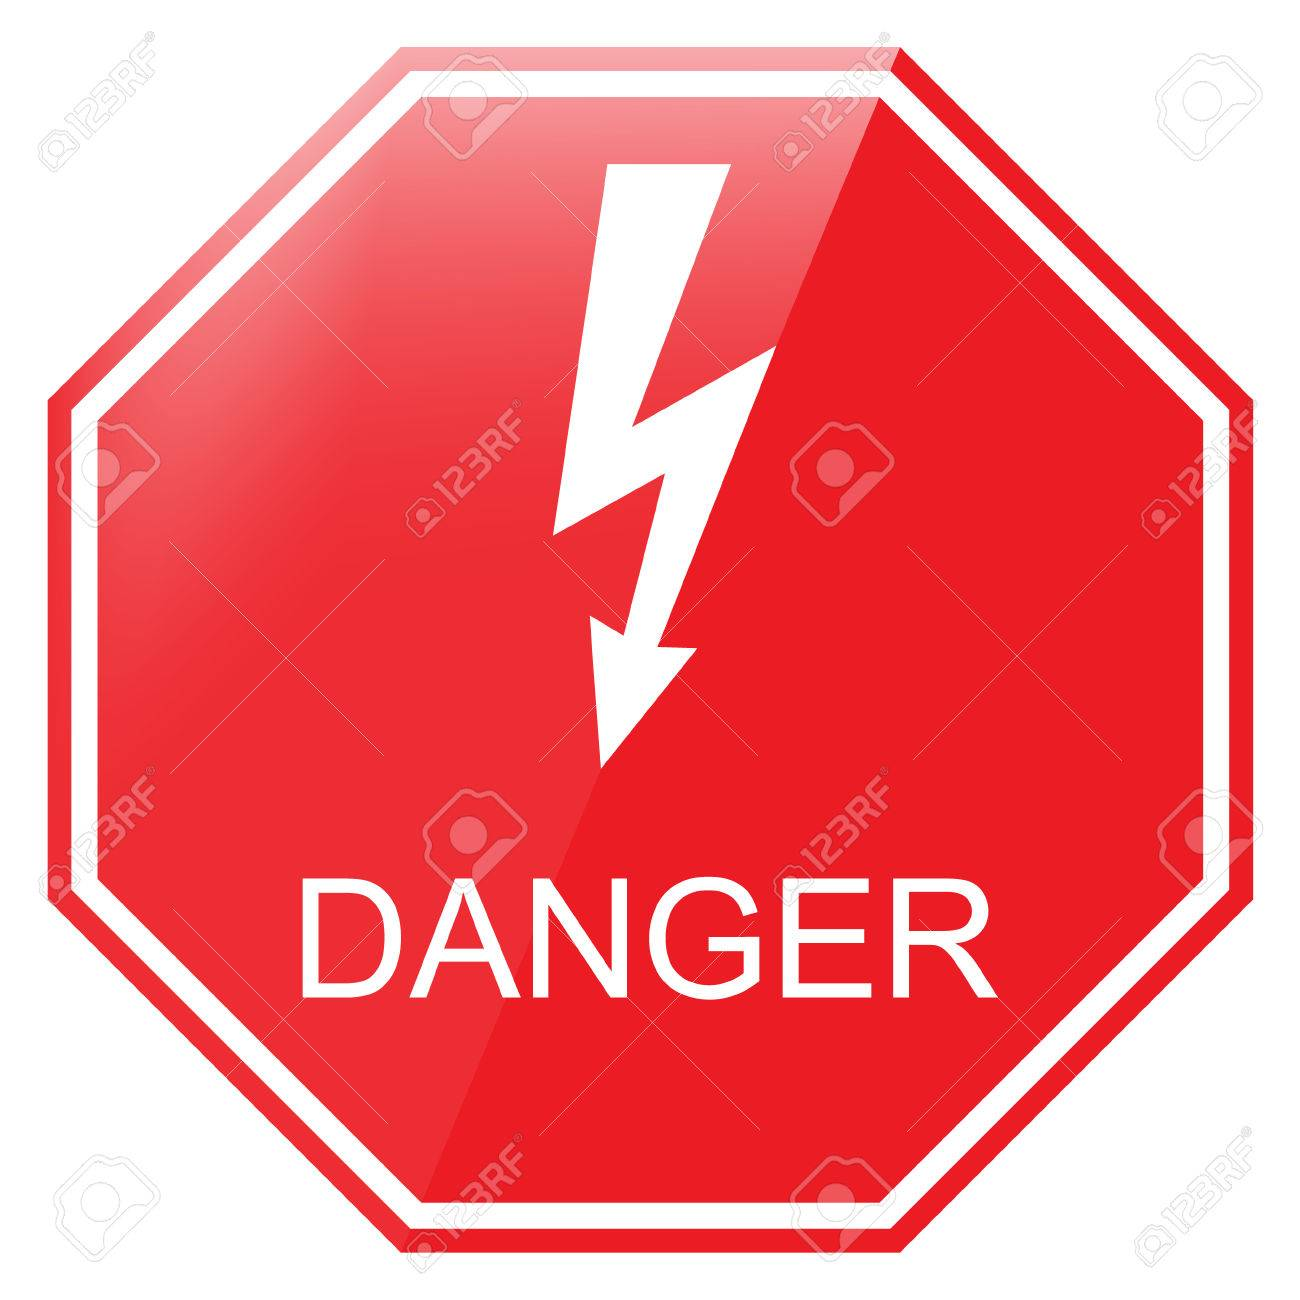 Vector illustration red octagon danger sign danger warning sign vector illustration red octagon danger sign danger warning sign high voltage symbol stock vector buycottarizona